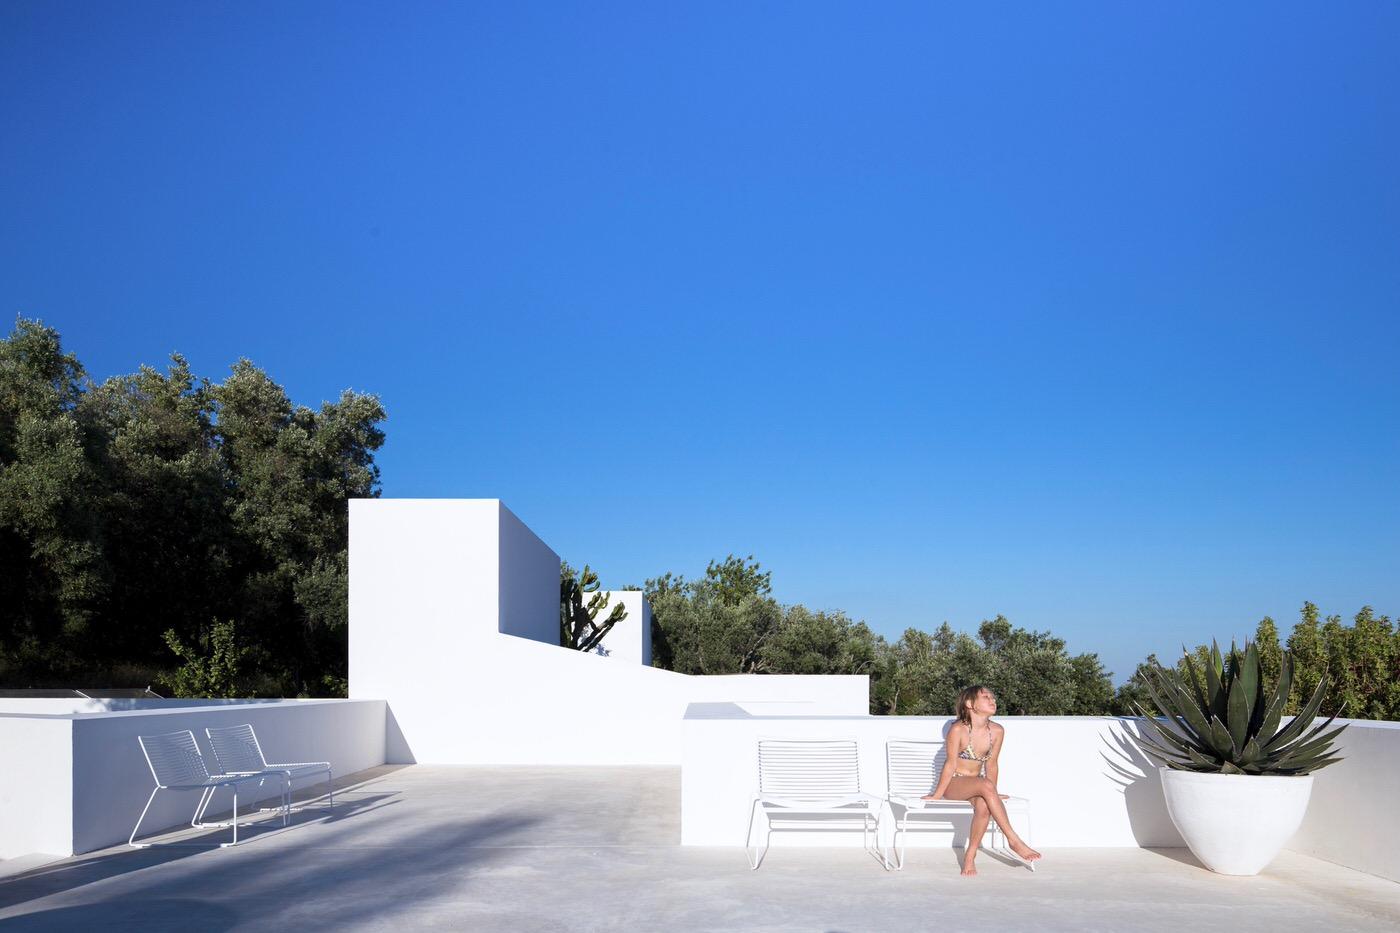 Zalig-Algarve-Casa-Luum-213-1